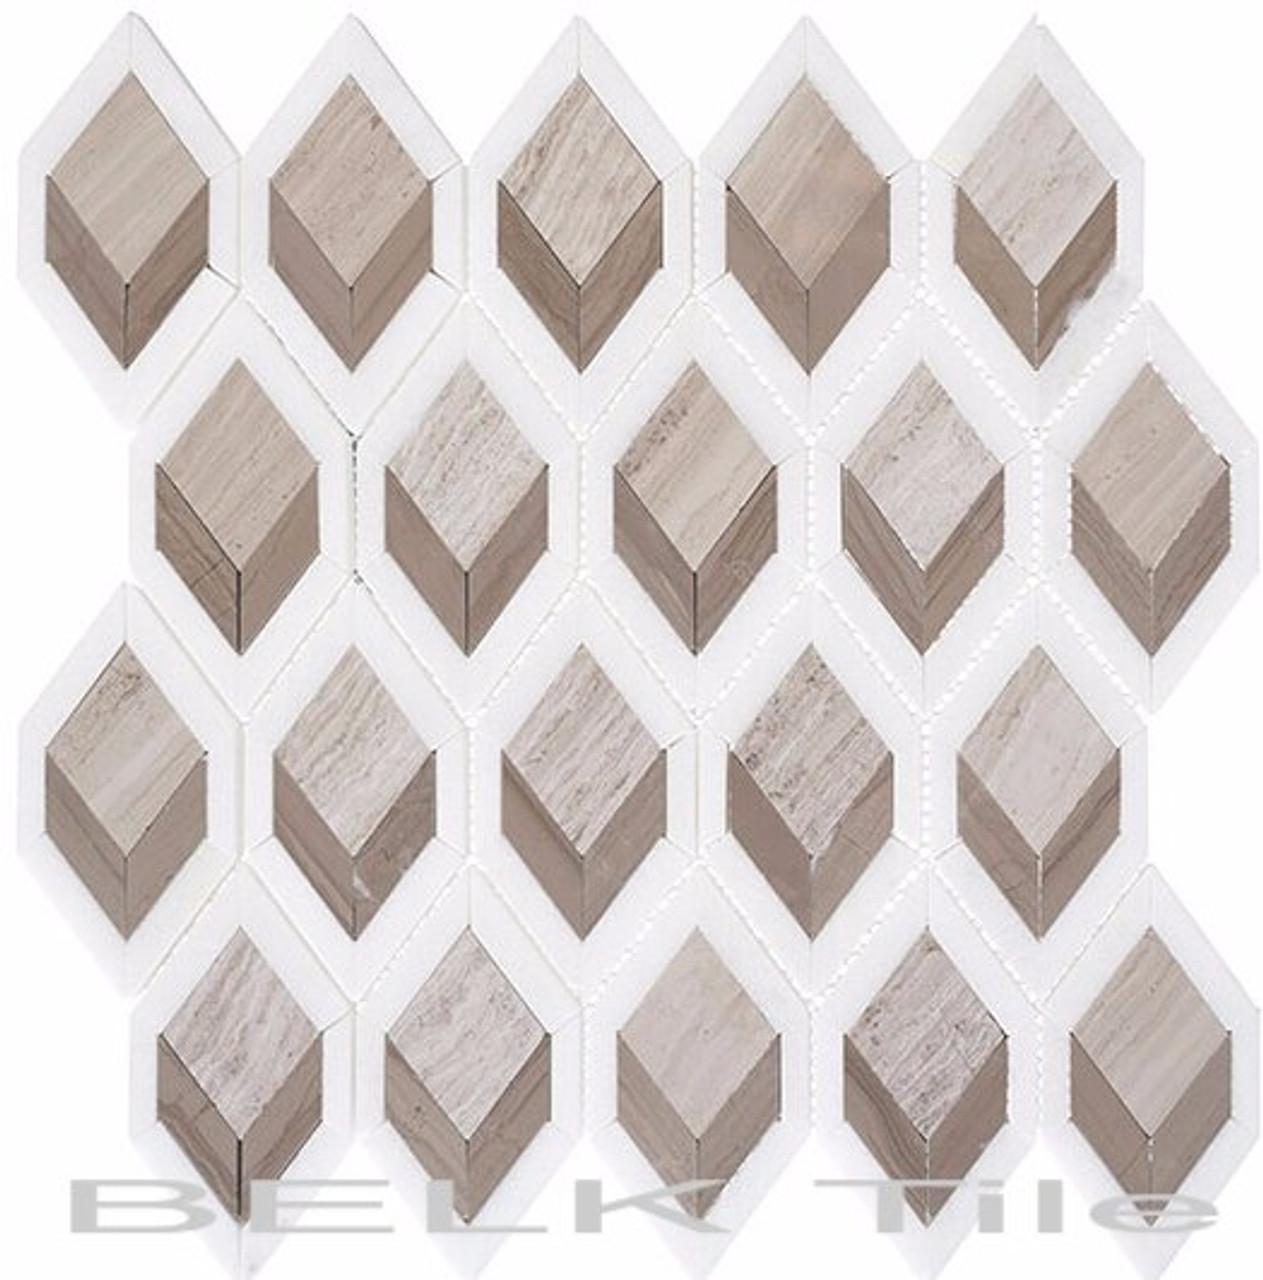 Bella Glass Tiles Ashbury Series Moonlit Passage